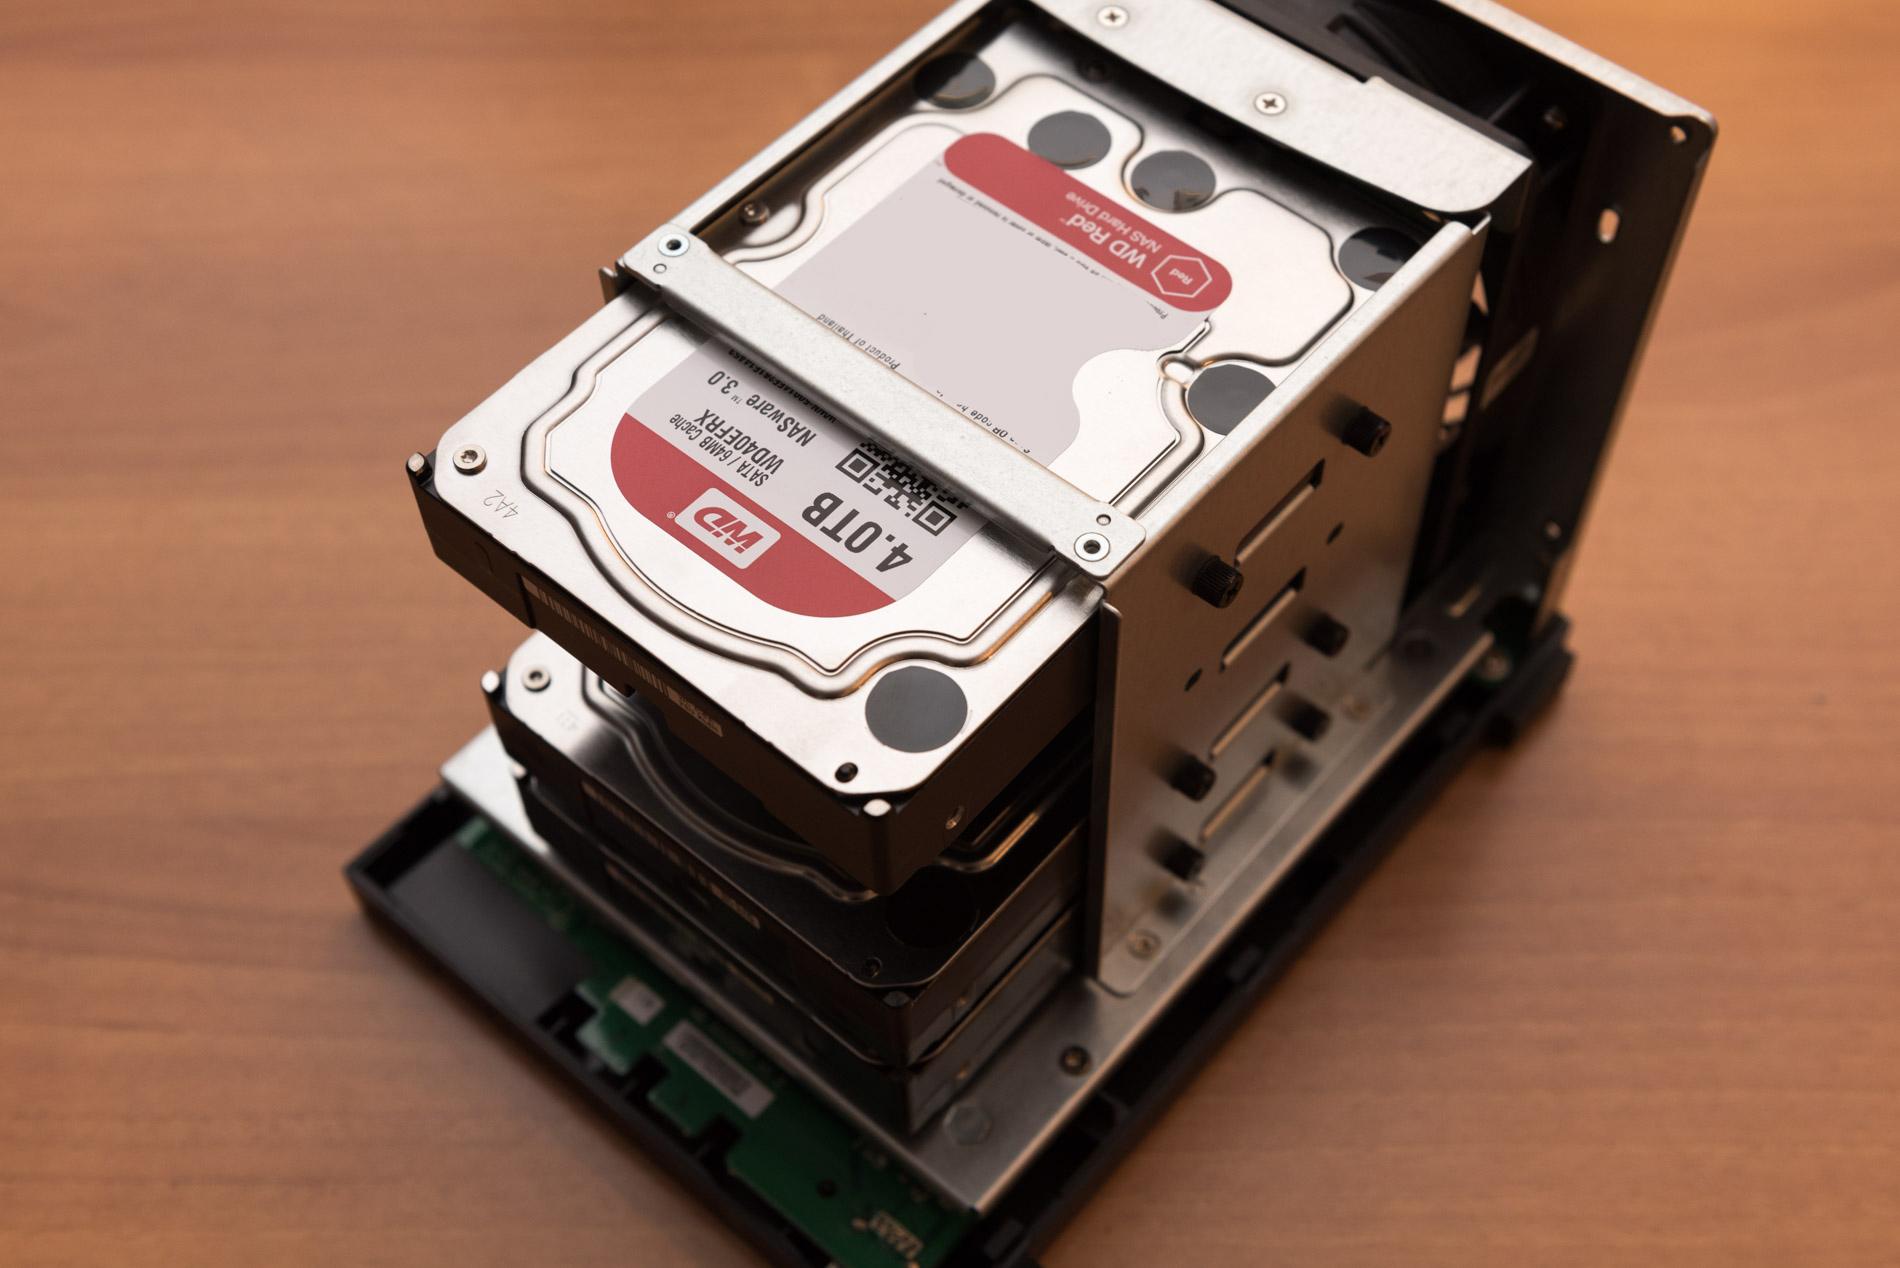 ASUSTOR AS1004T test hard disk performance